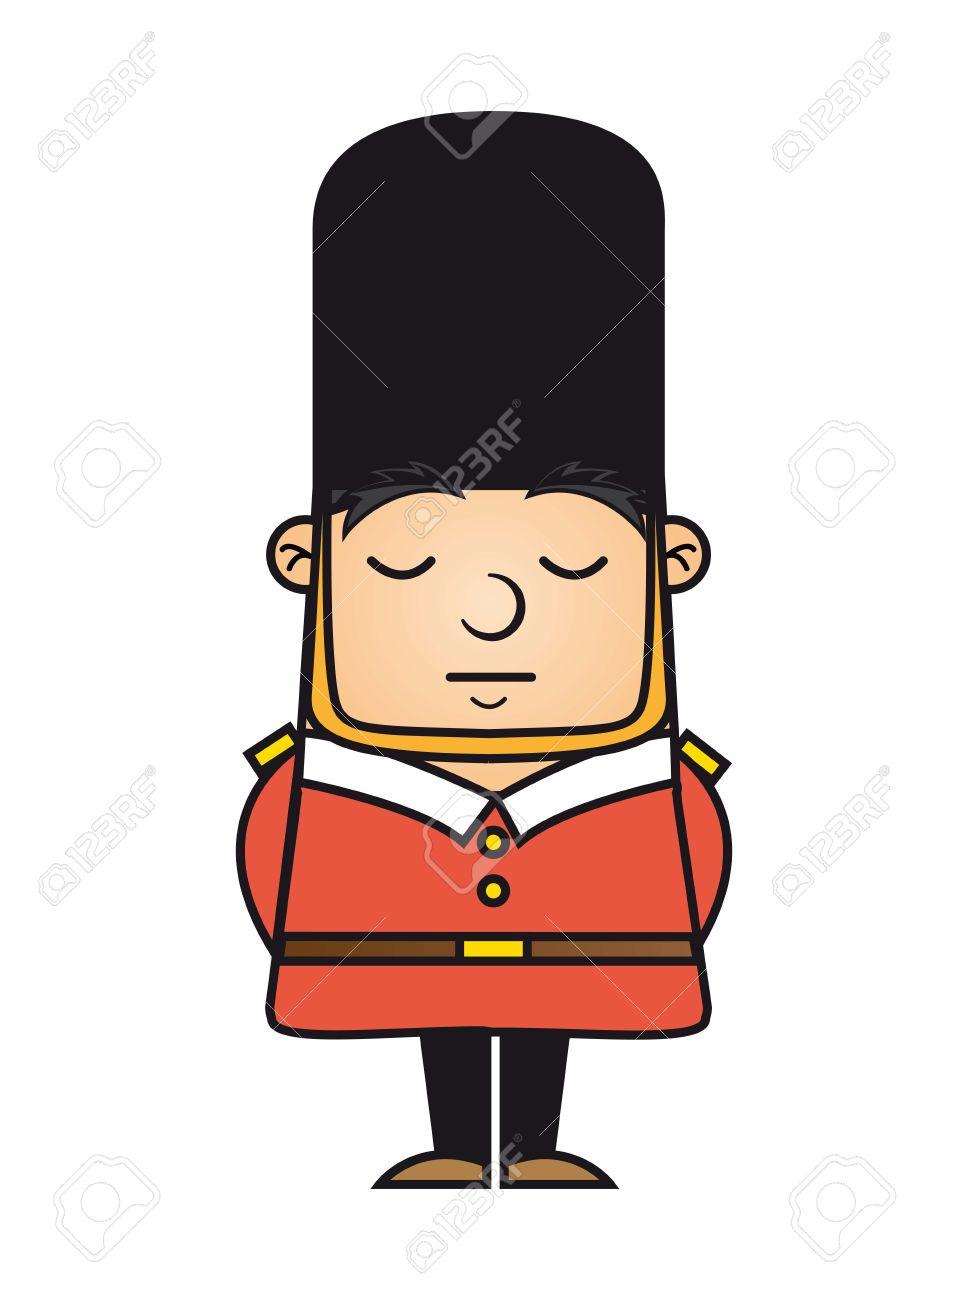 968x1300 Royal Guards Clipart London Guard